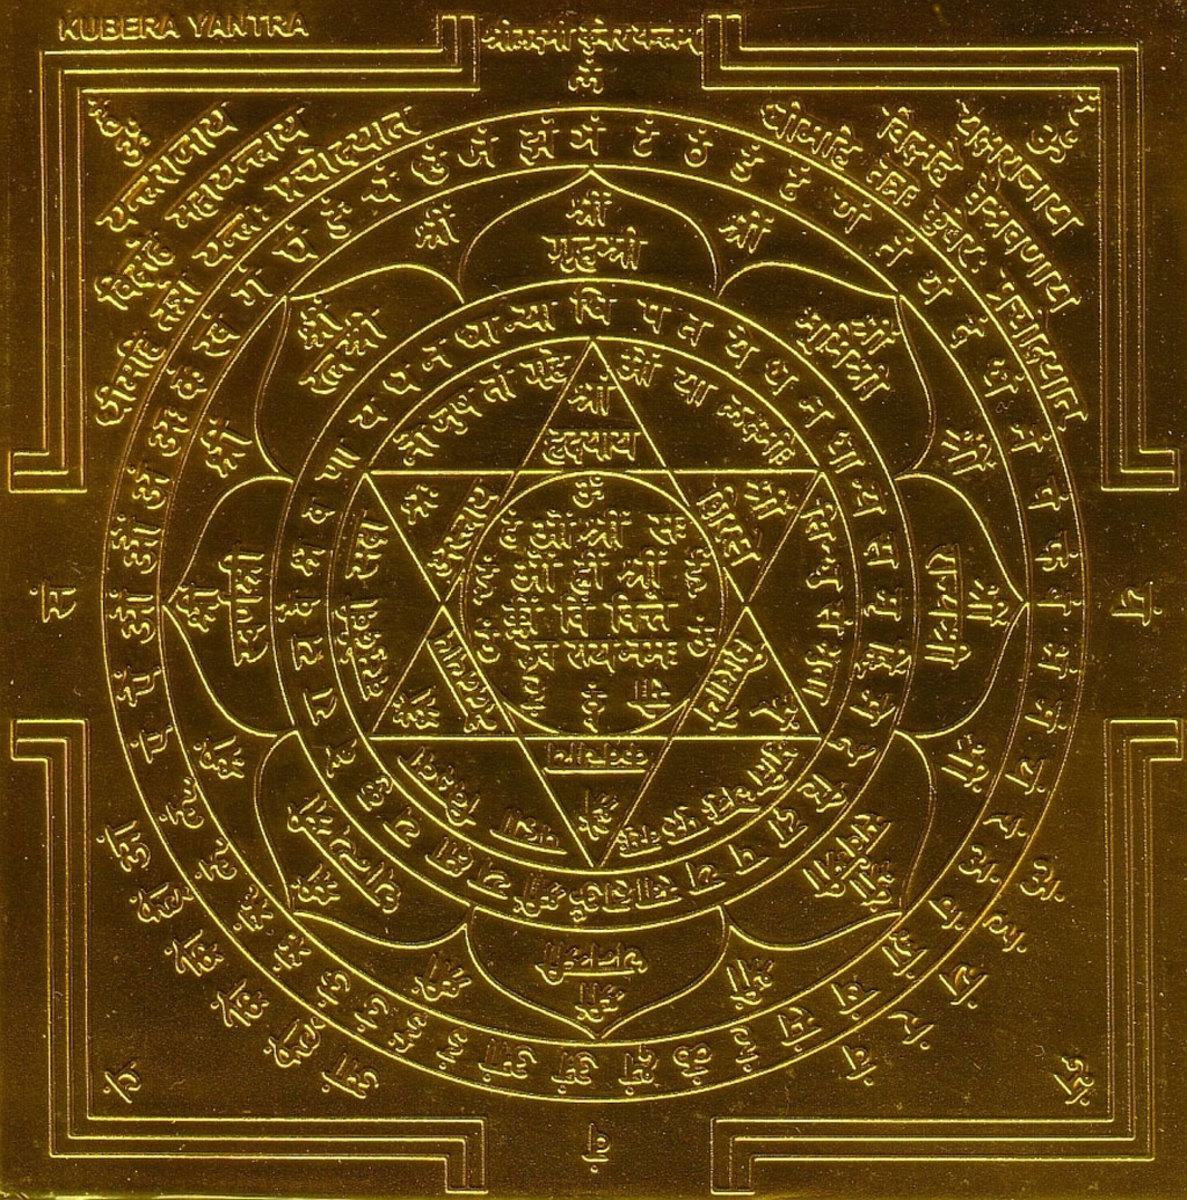 Kuber Yantra (Kubera Yantra) prosperity symbol